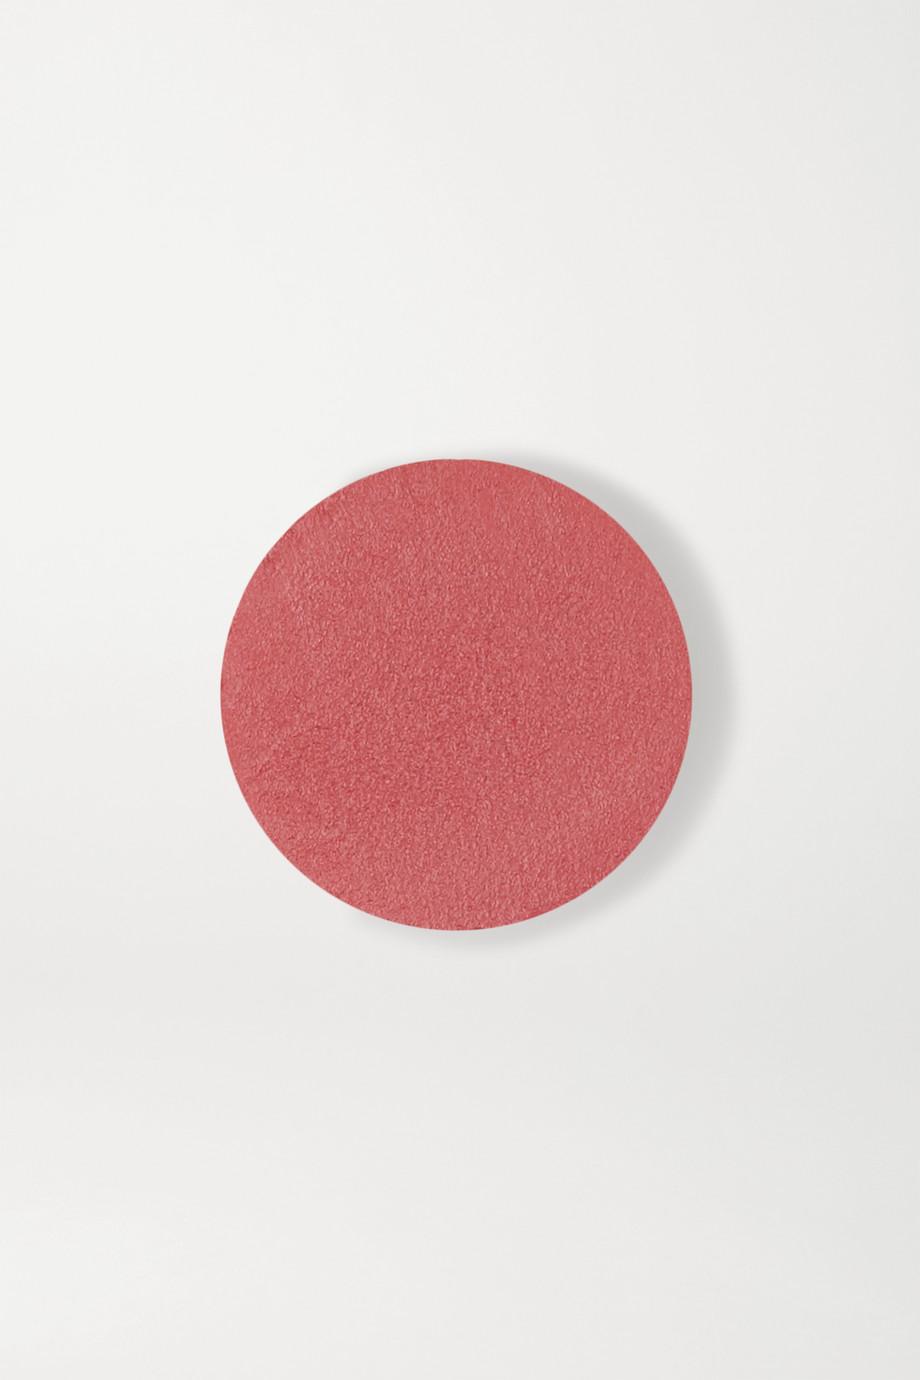 La Bouche Rouge Satin Lipstick Refill - Nude Pink